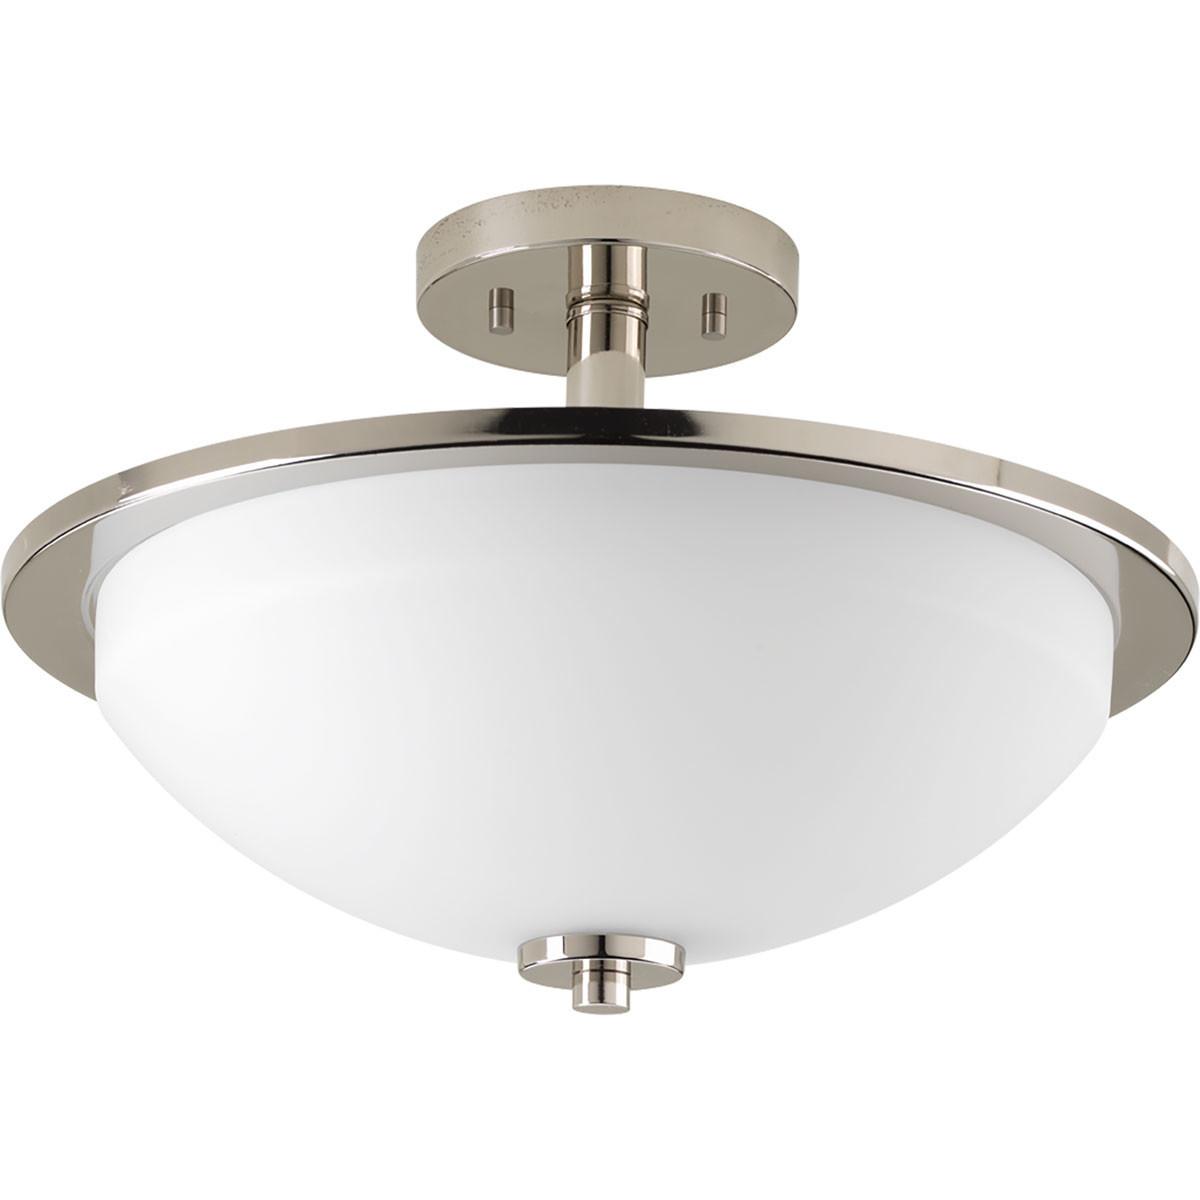 Best ideas about Semi Flush Mount Lighting . Save or Pin Progress Lighting Replay 2 Light Semi Flush Mount Now.